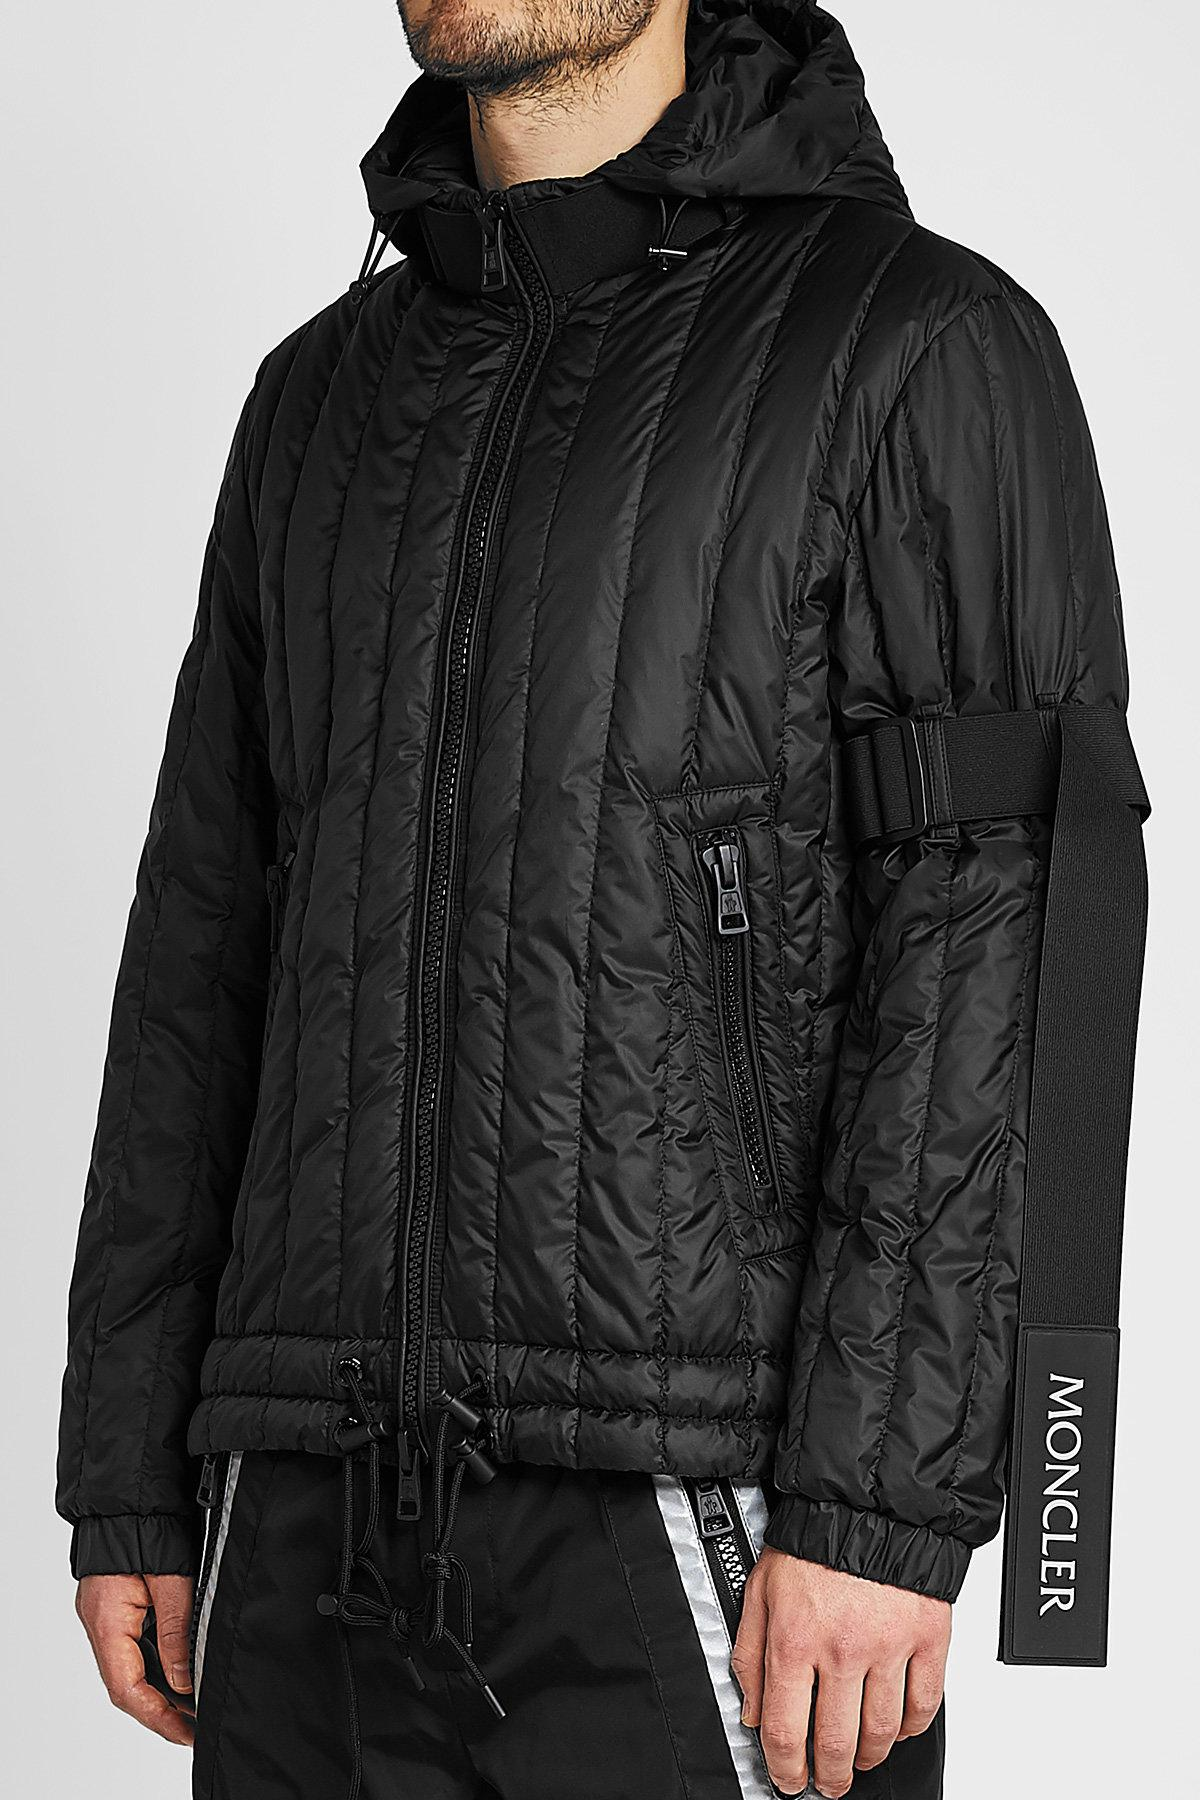 0f81b3774 Moncler X Craig Green Banach Down Jacket for men